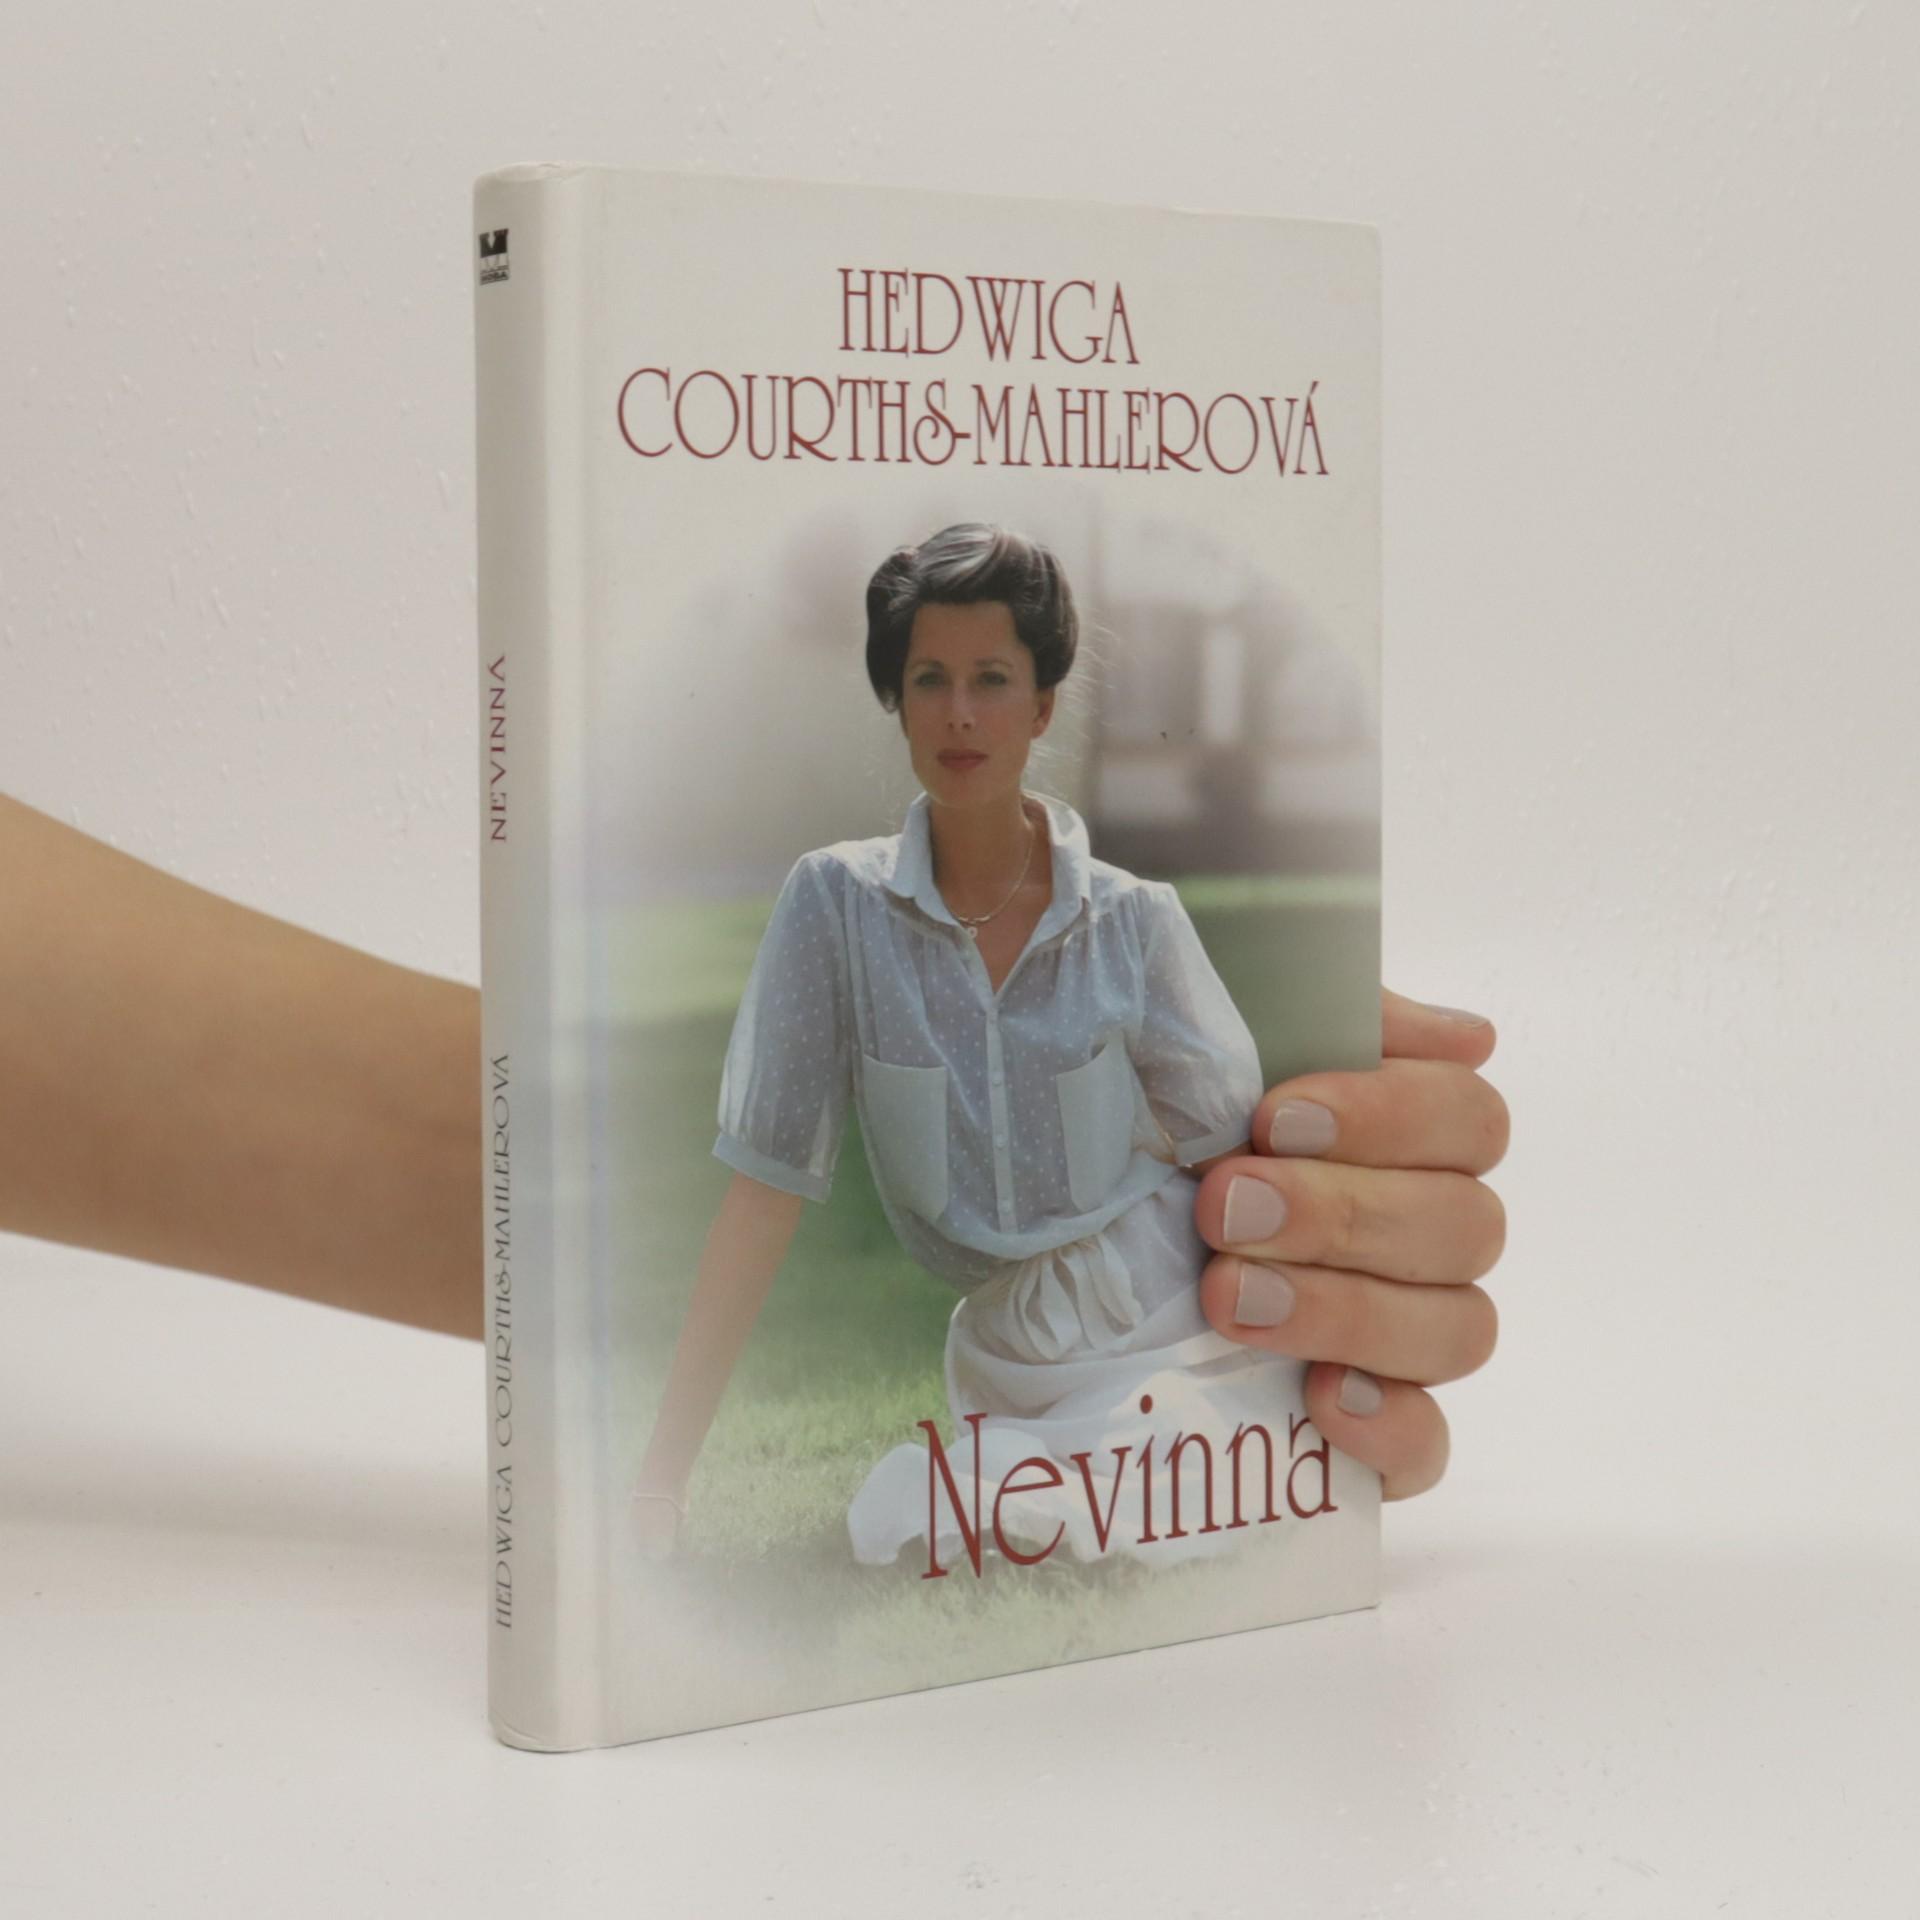 antikvární kniha Nevinná, 1997